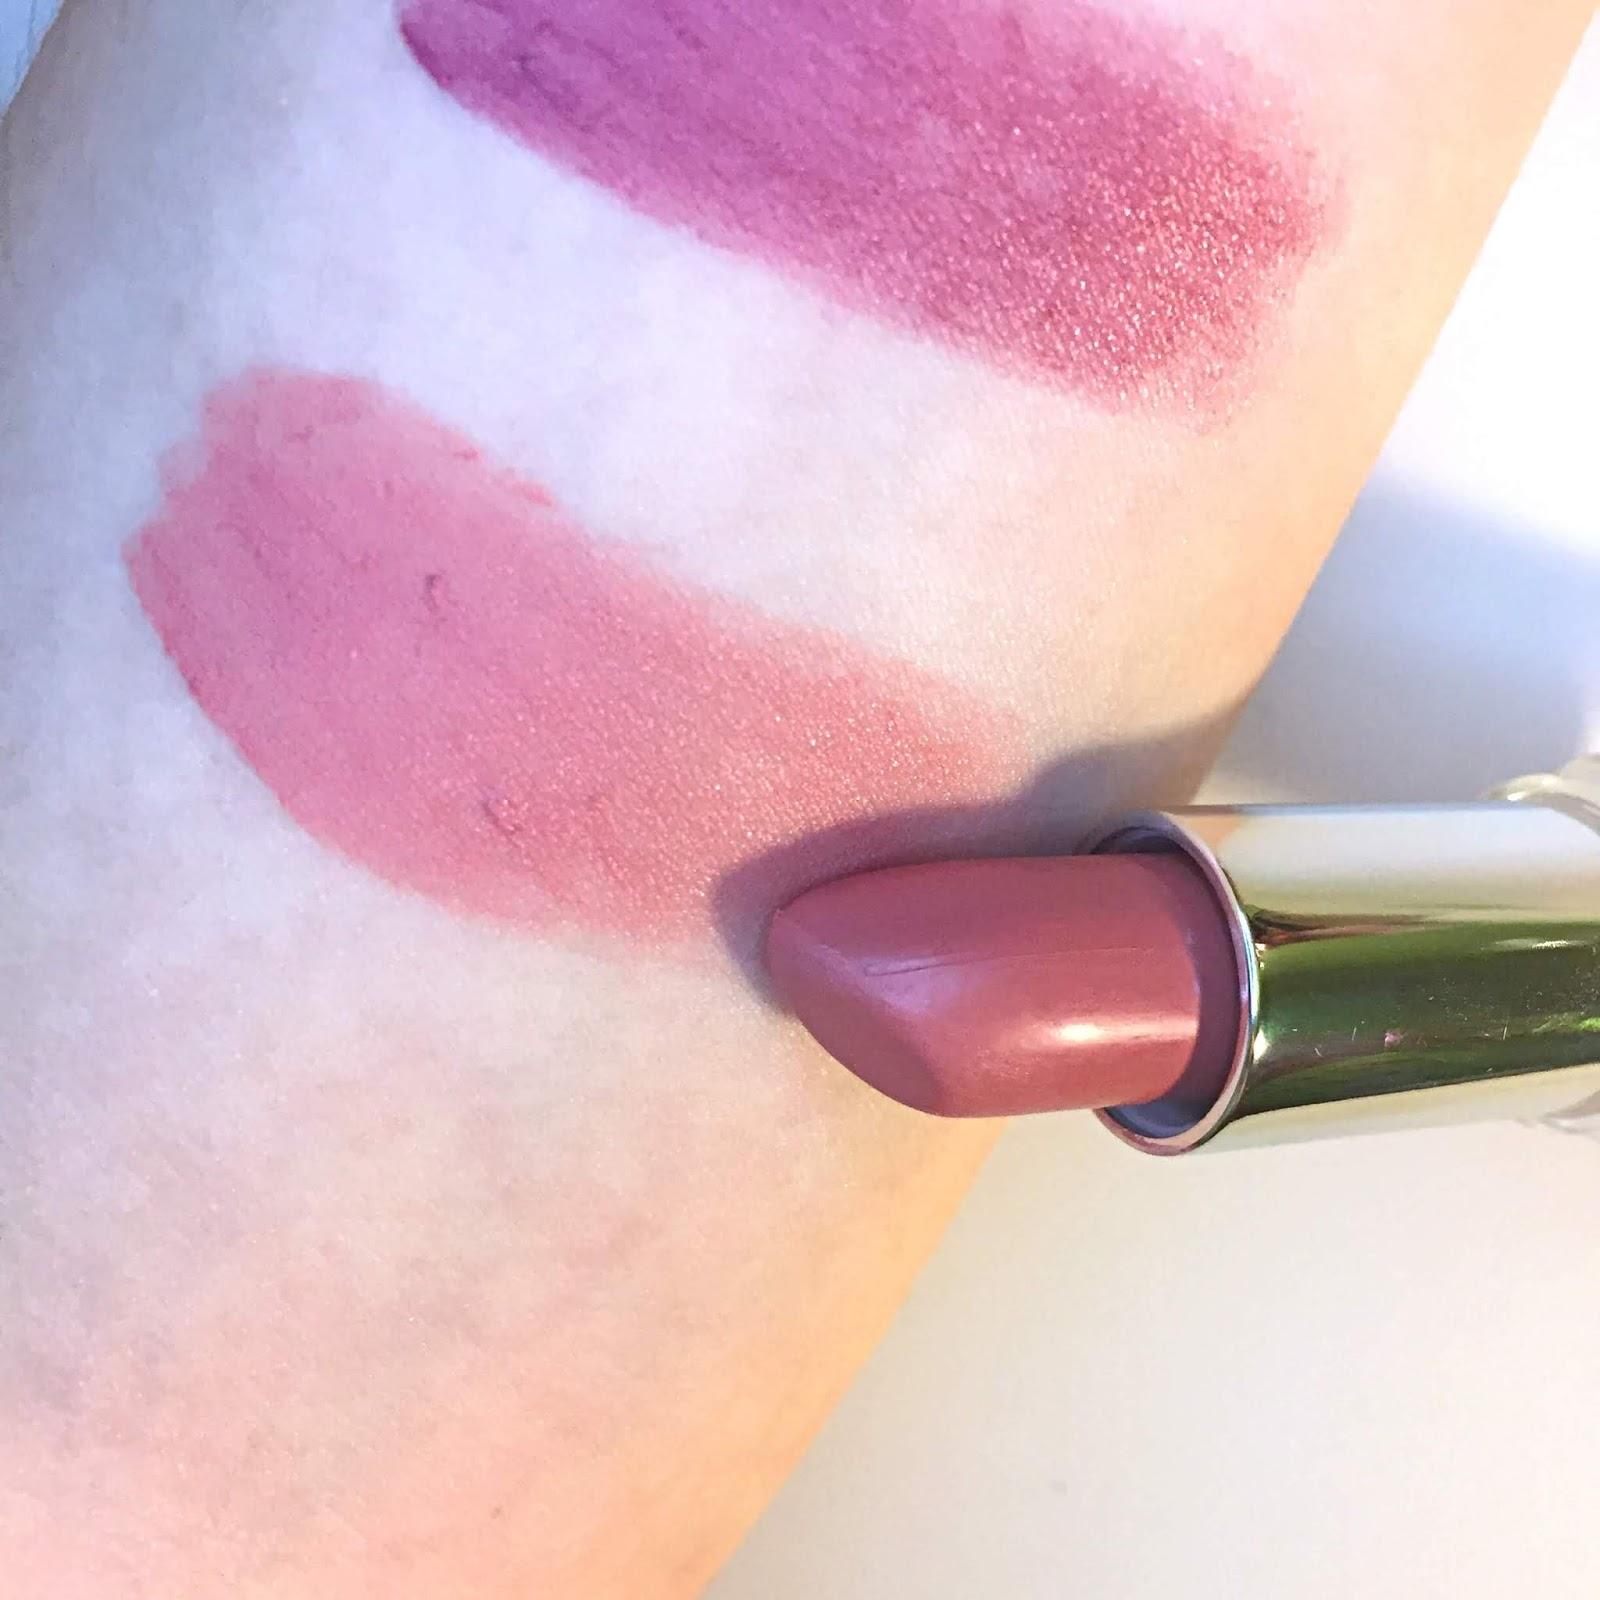 e.l.f. Beautifully Bare Satin Lipstick Touch of Pink